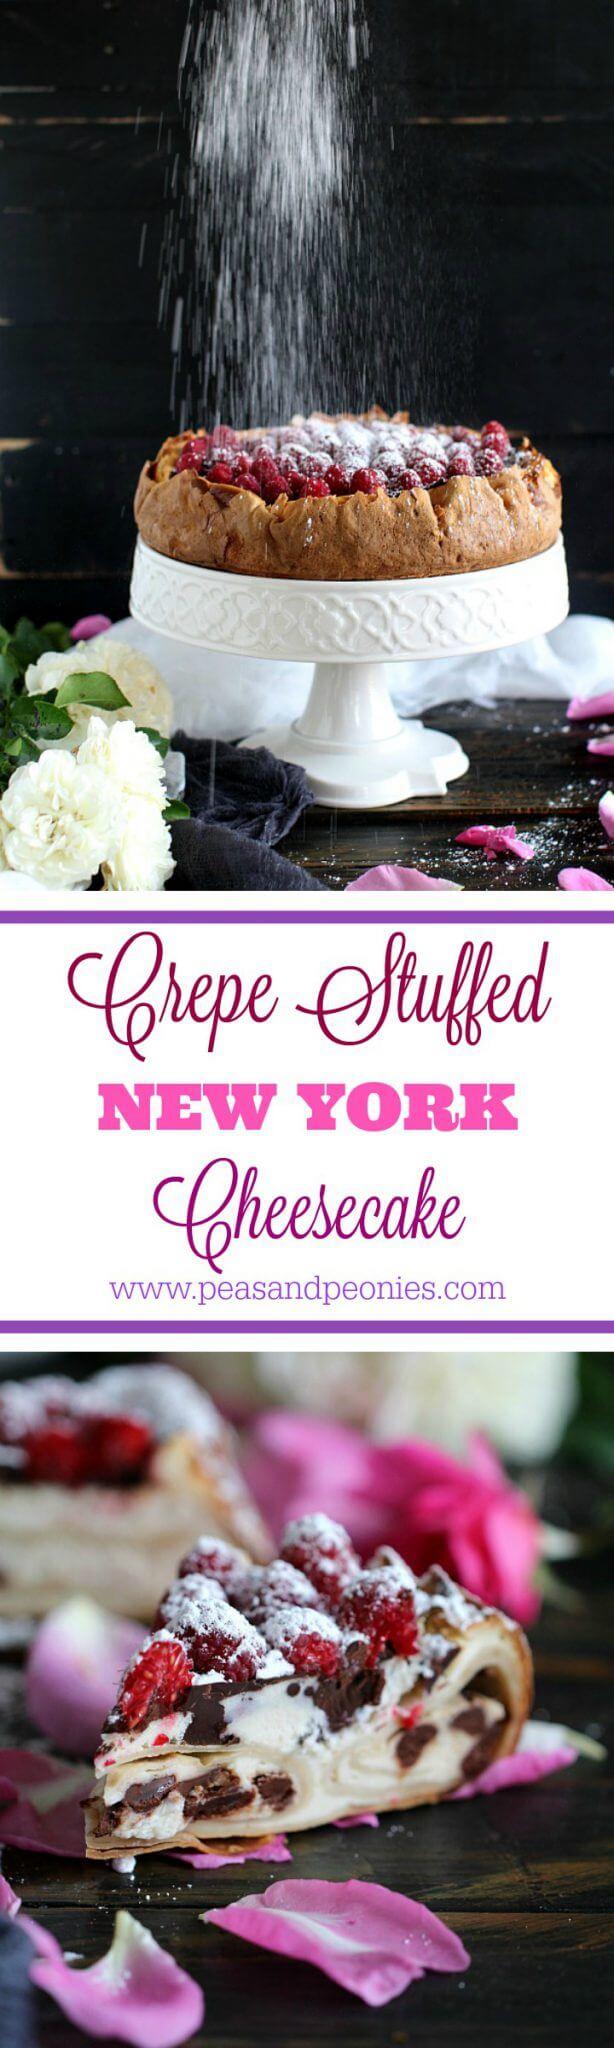 crepe stuffed New York cheesecake